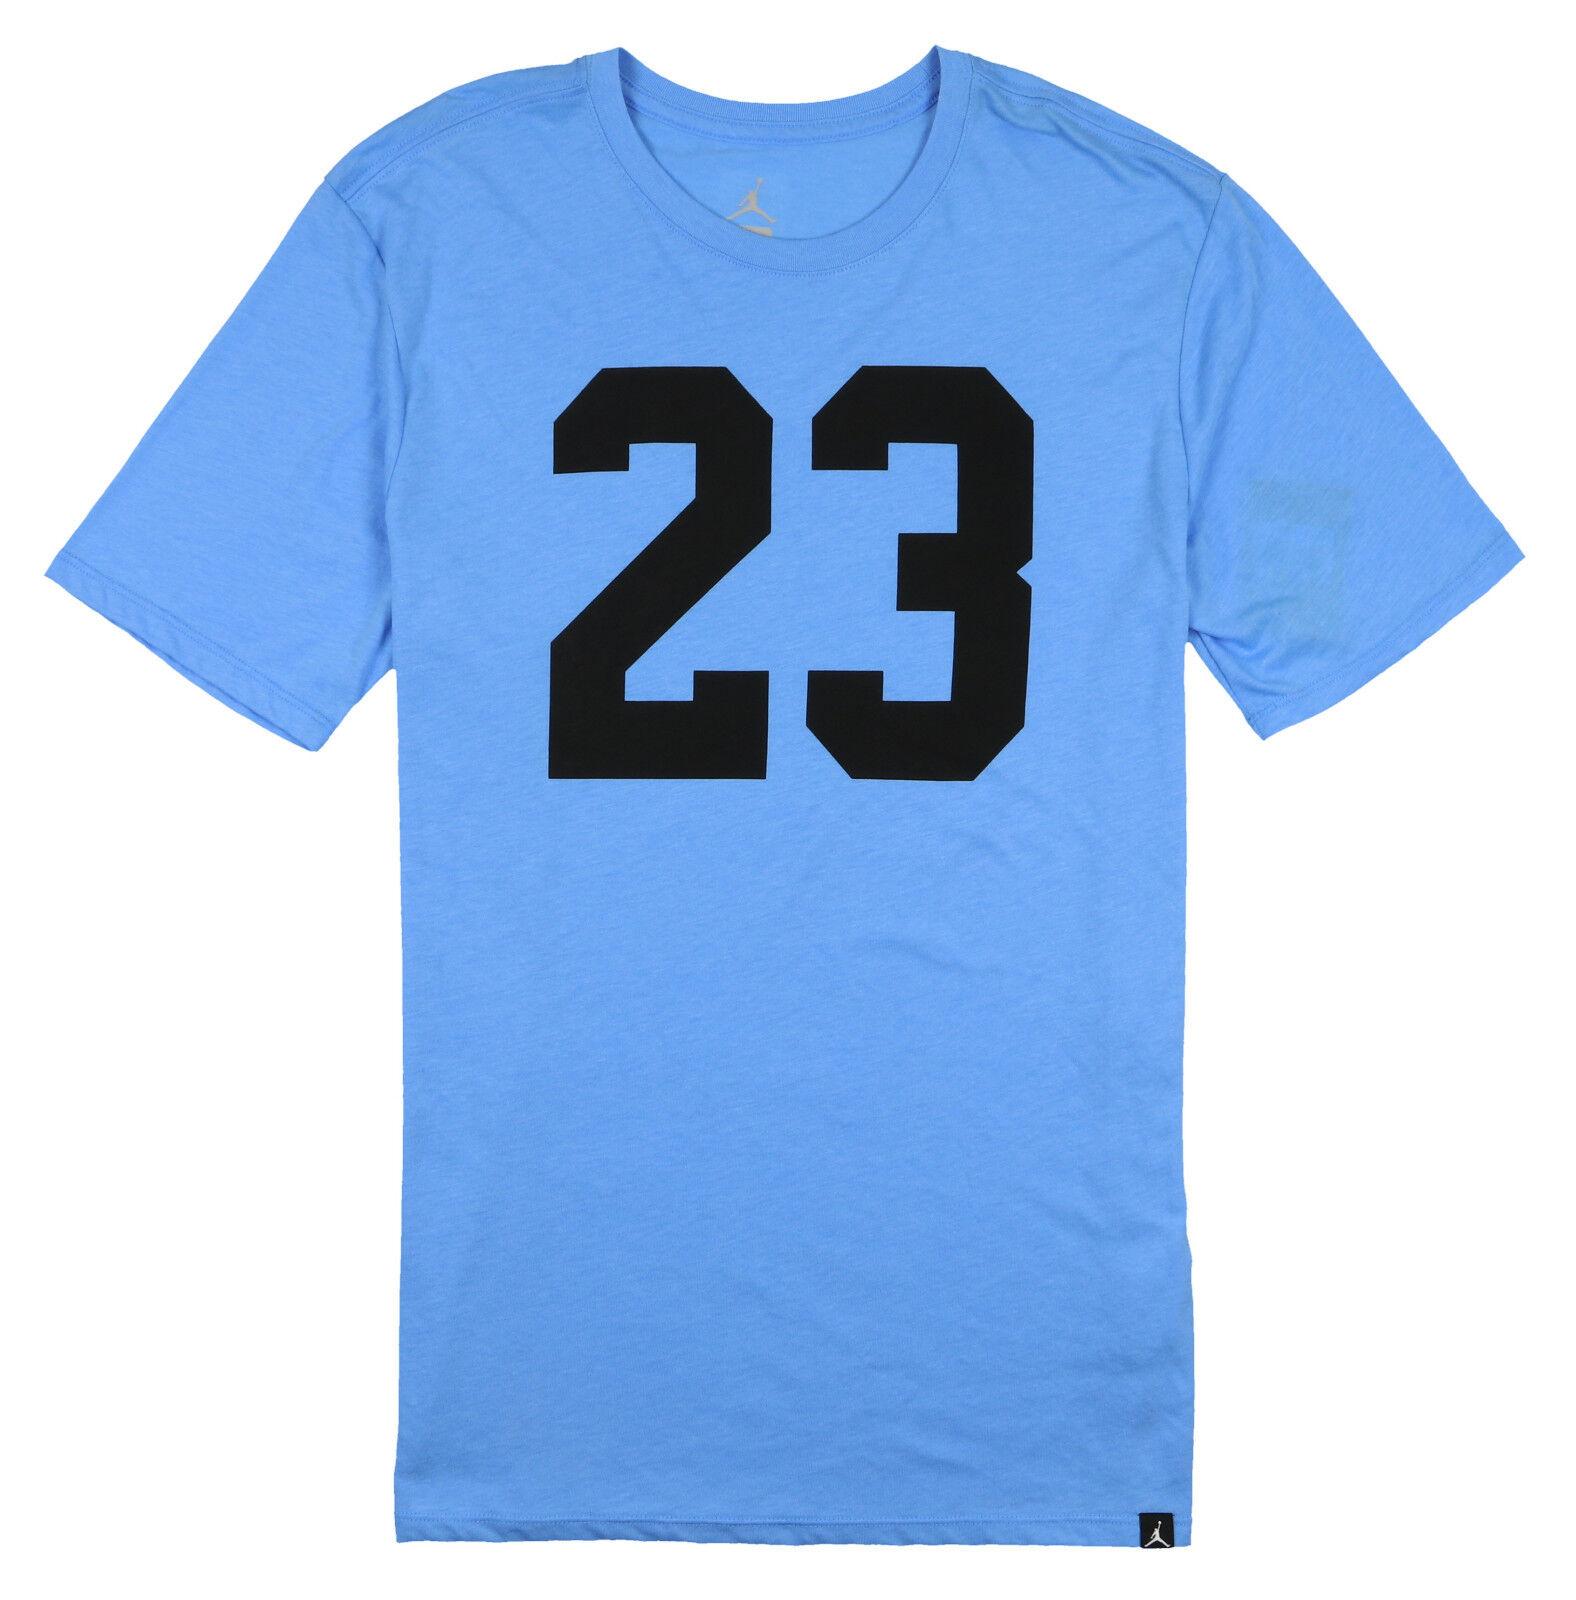 JORDAN Tri-Blend Iconic 23 T-Shirt sz M Medium University bluee Retro Flight